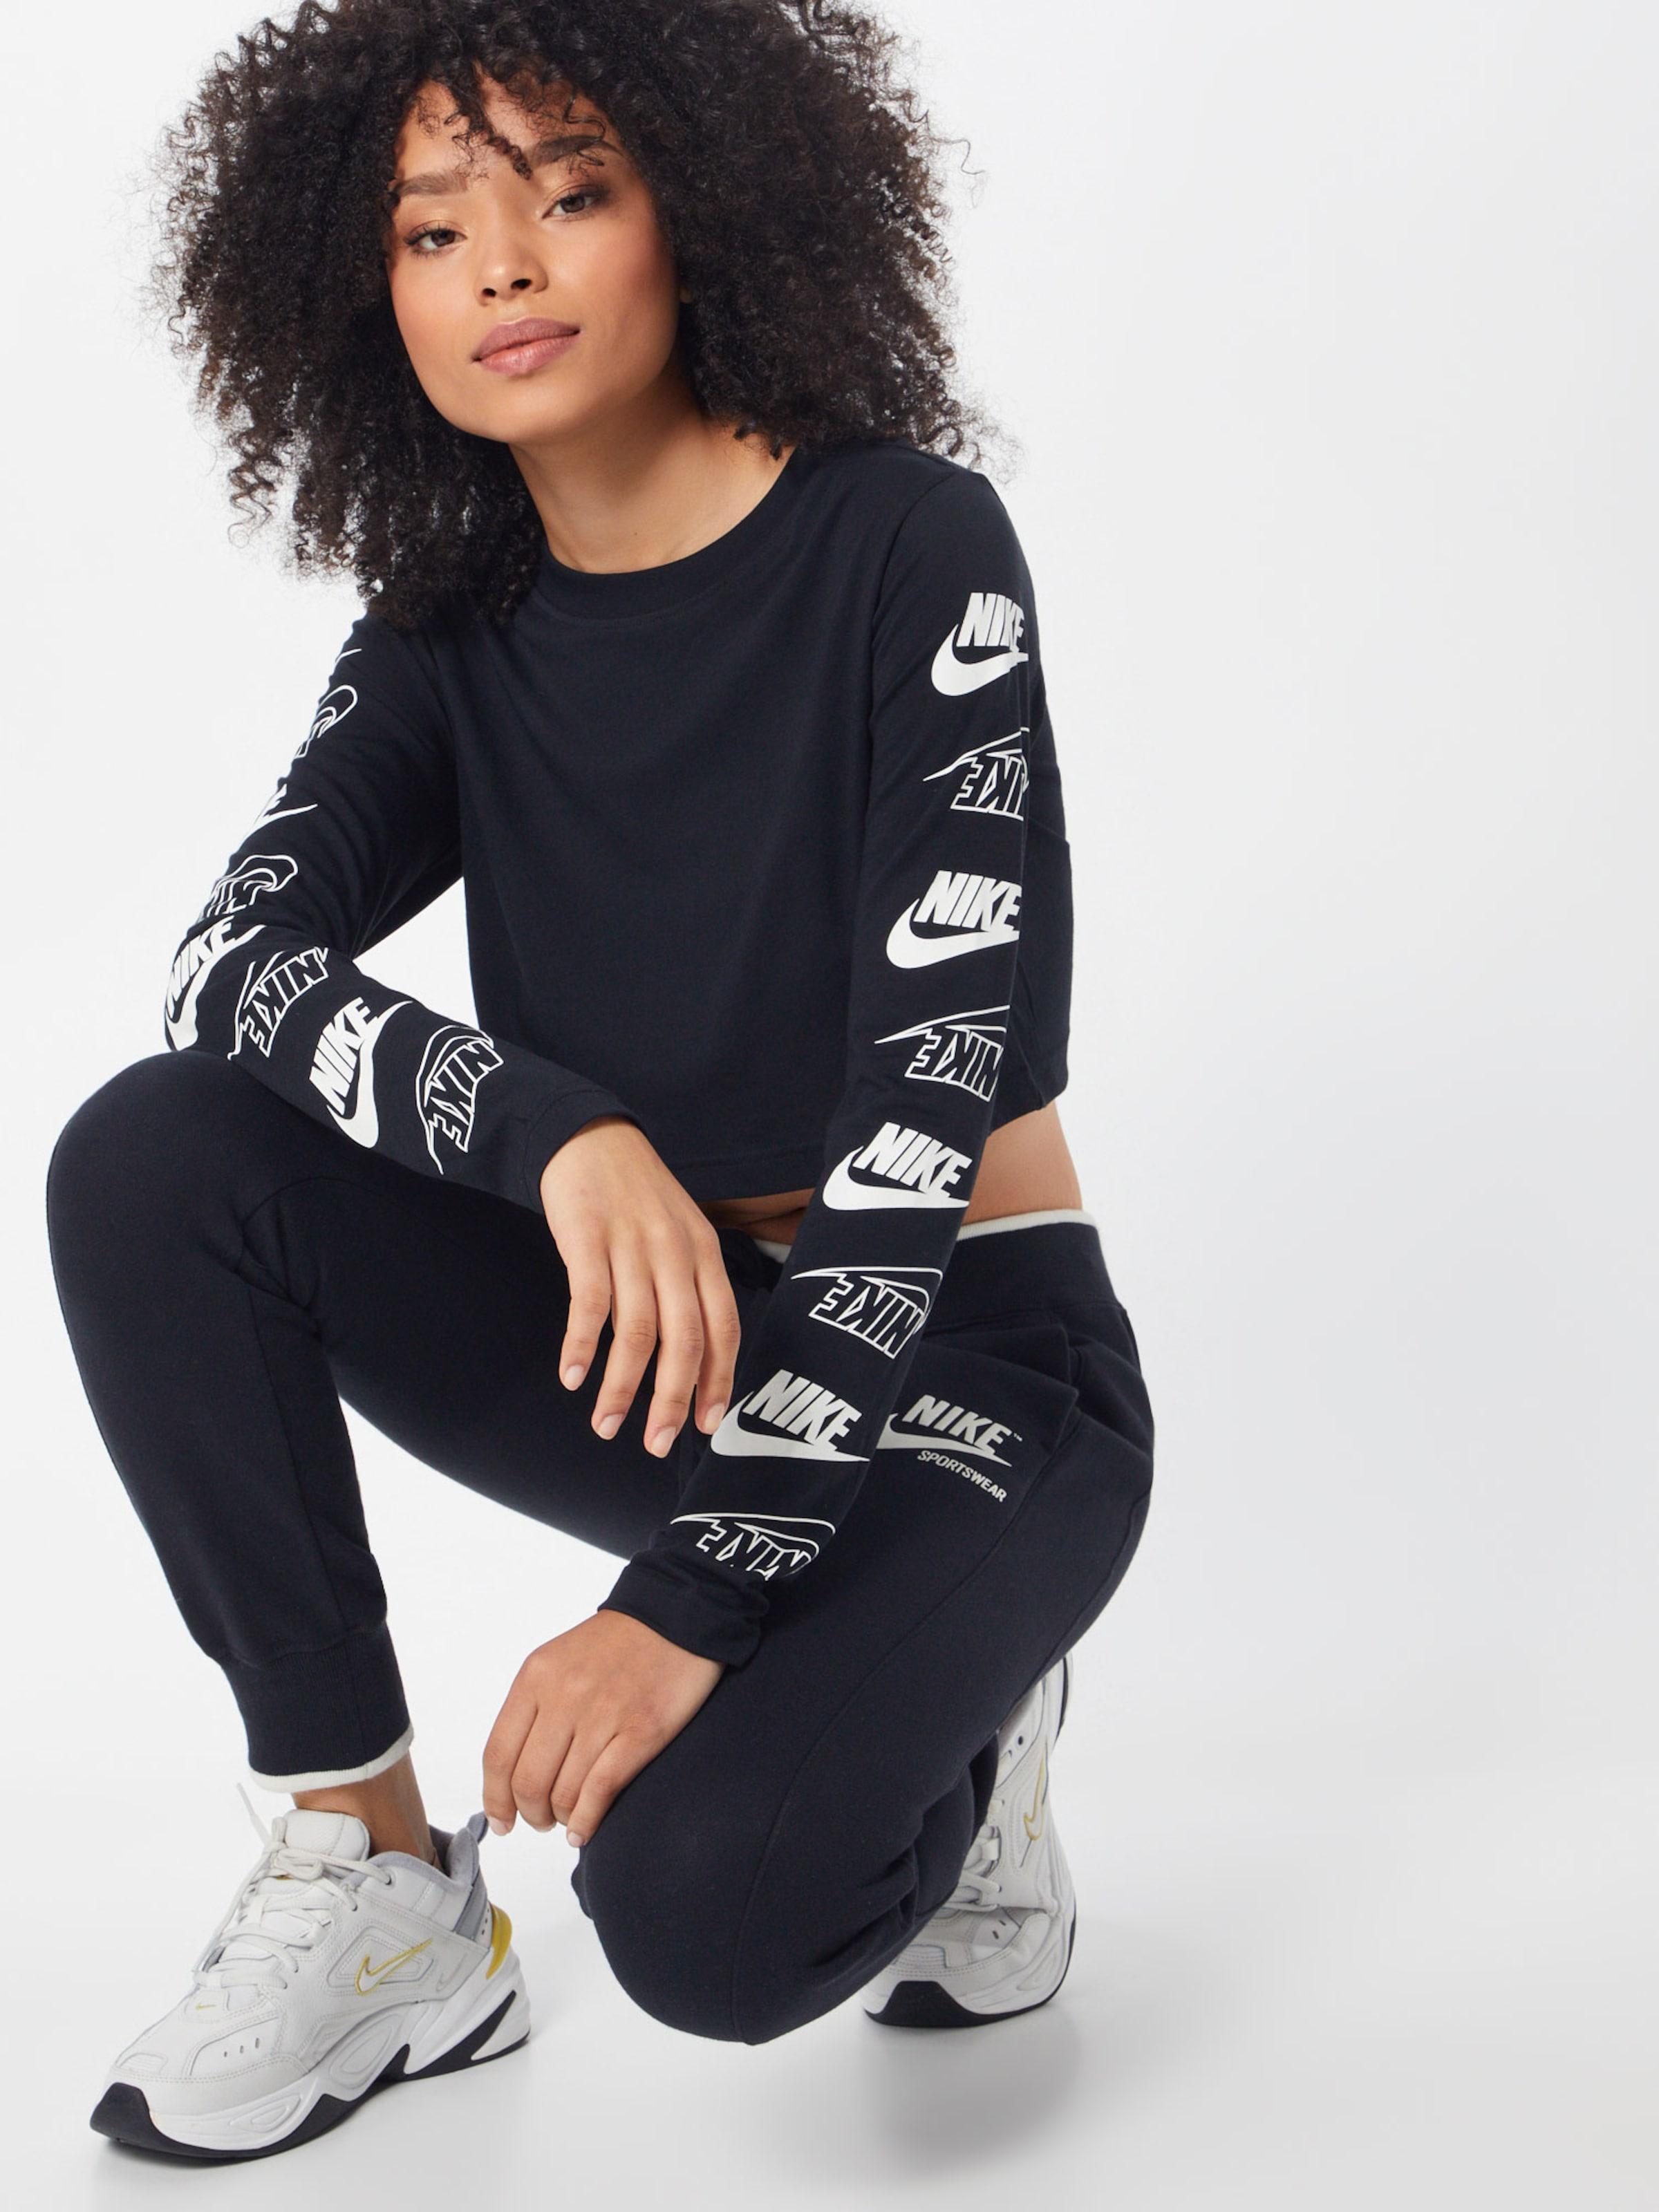 Nike shirt T NoirBlanc En Sportswear 'futura Crop' Flip 8m0NwnyvO